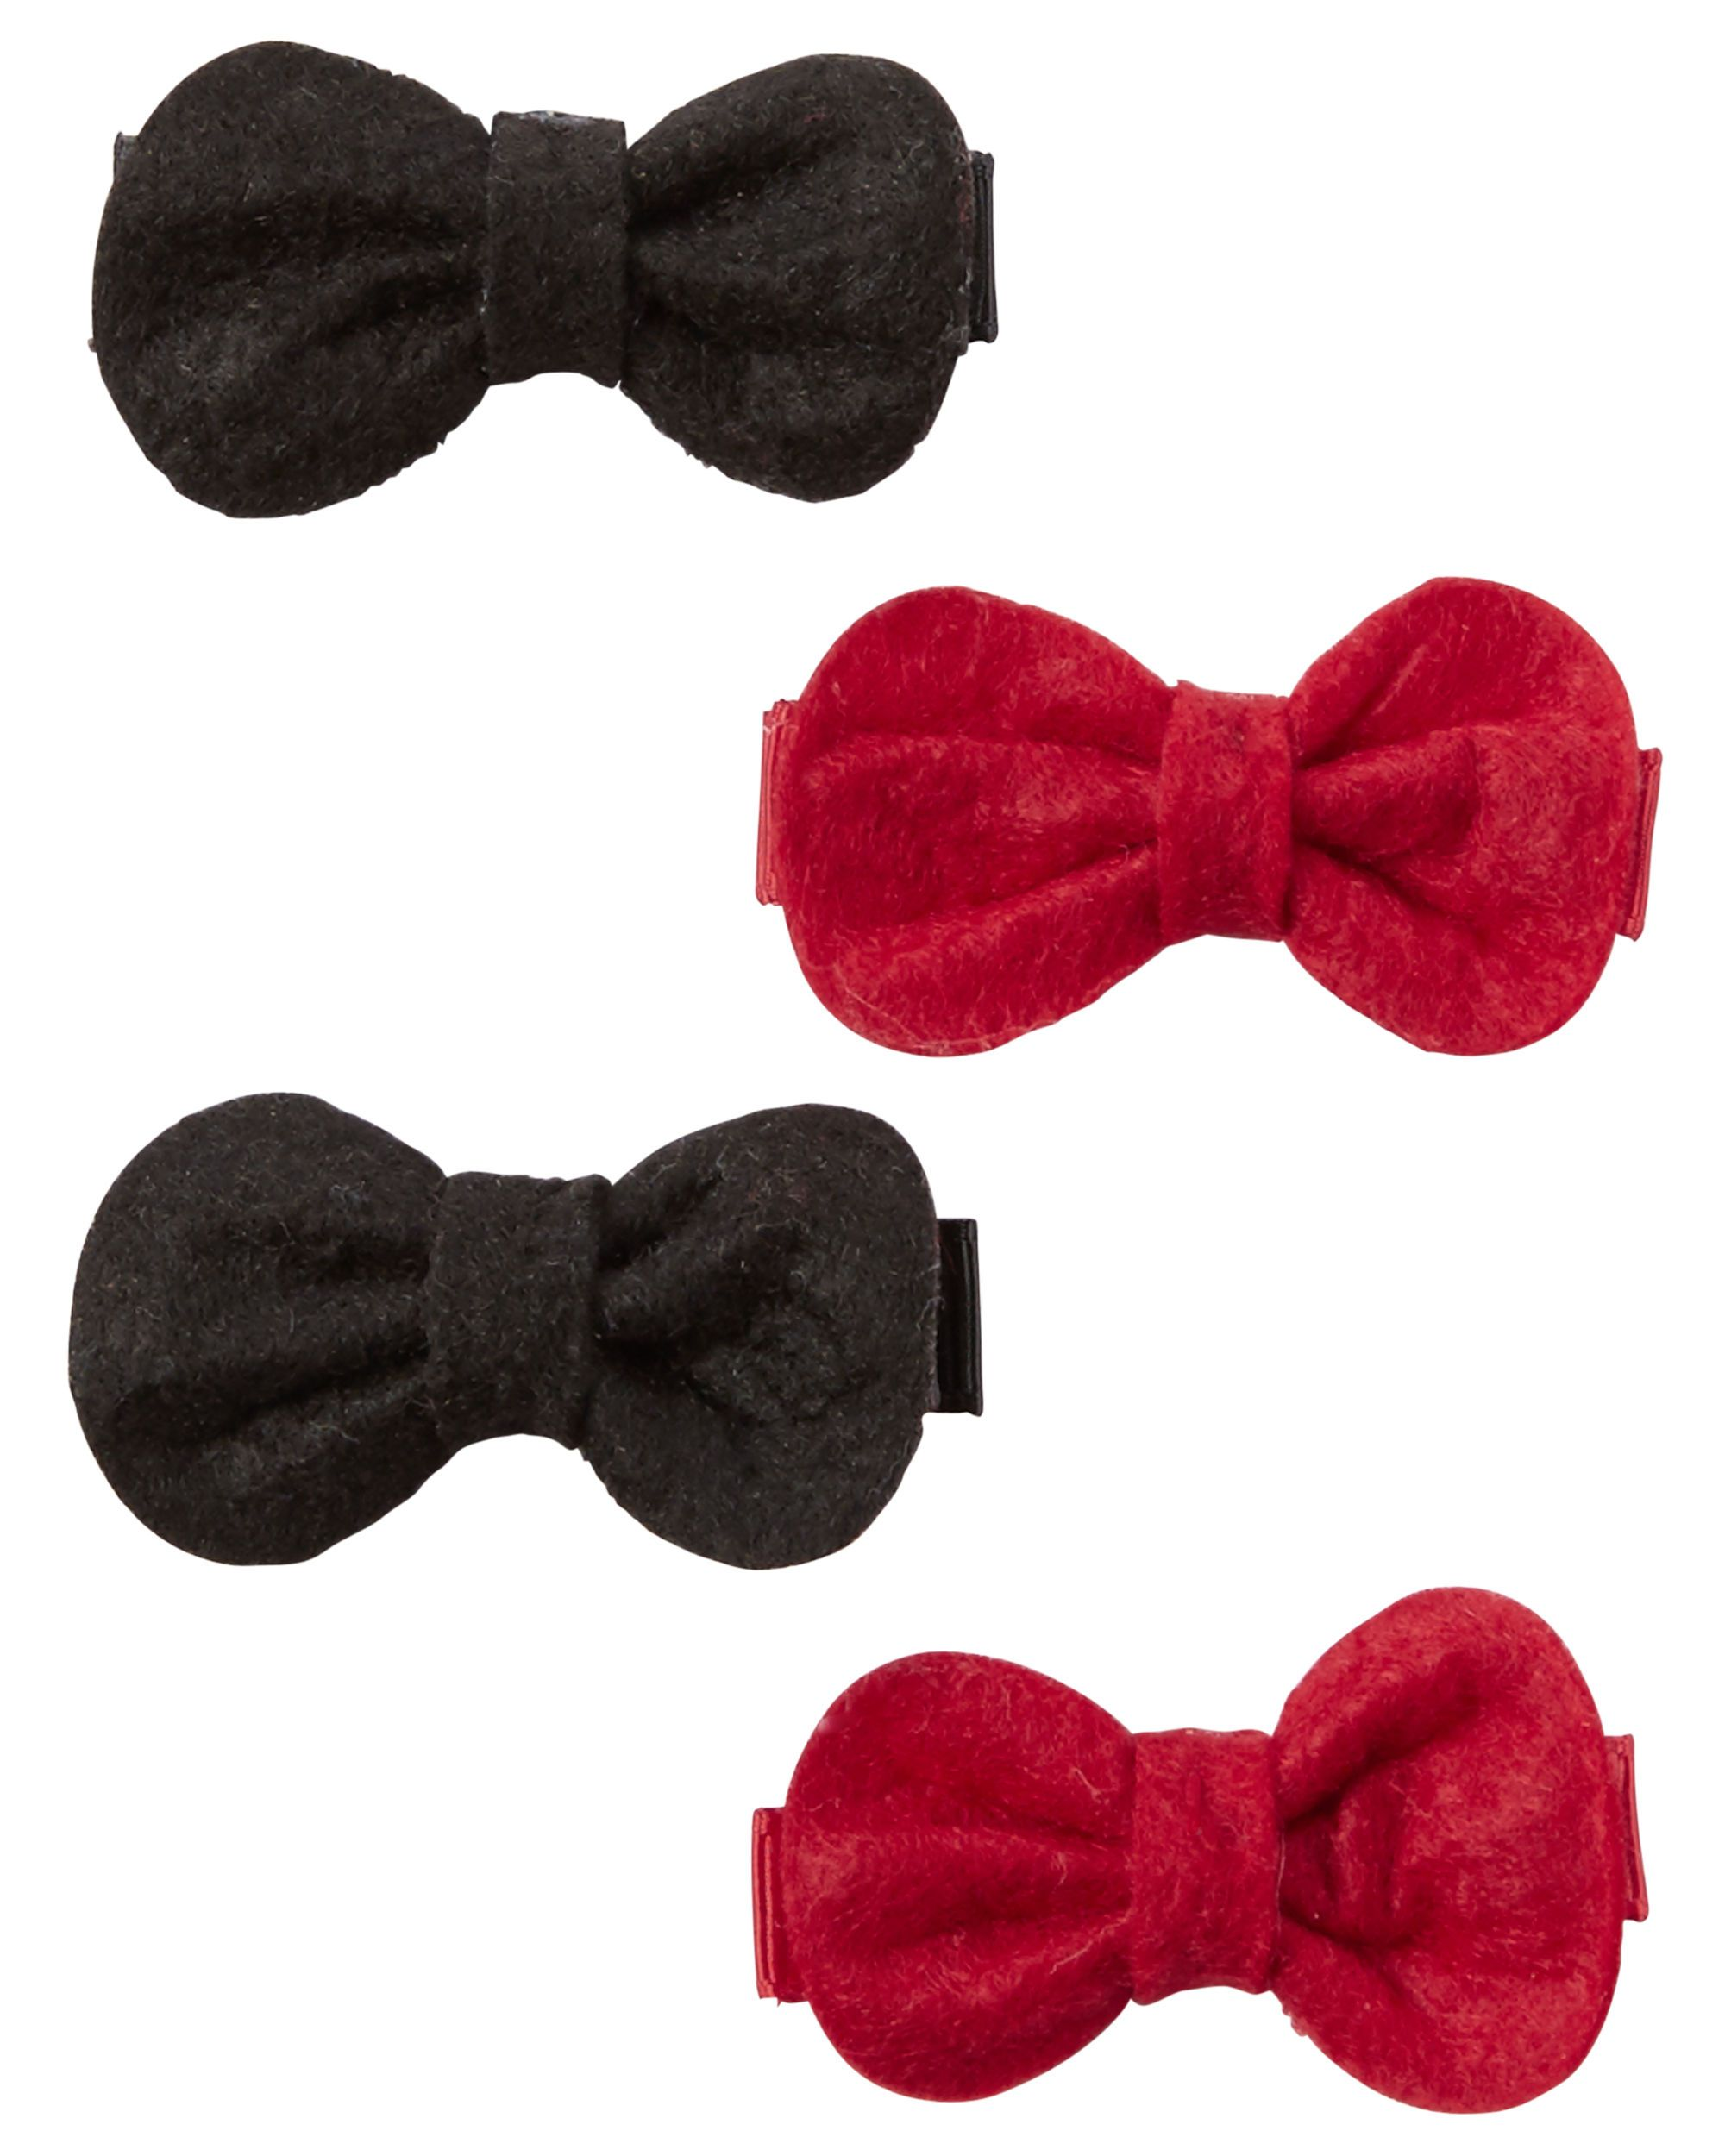 1d6295ff2 4-Pack Bow Hair Clips | Carter's | Hair Clips, Bow hair clips, Baby ...